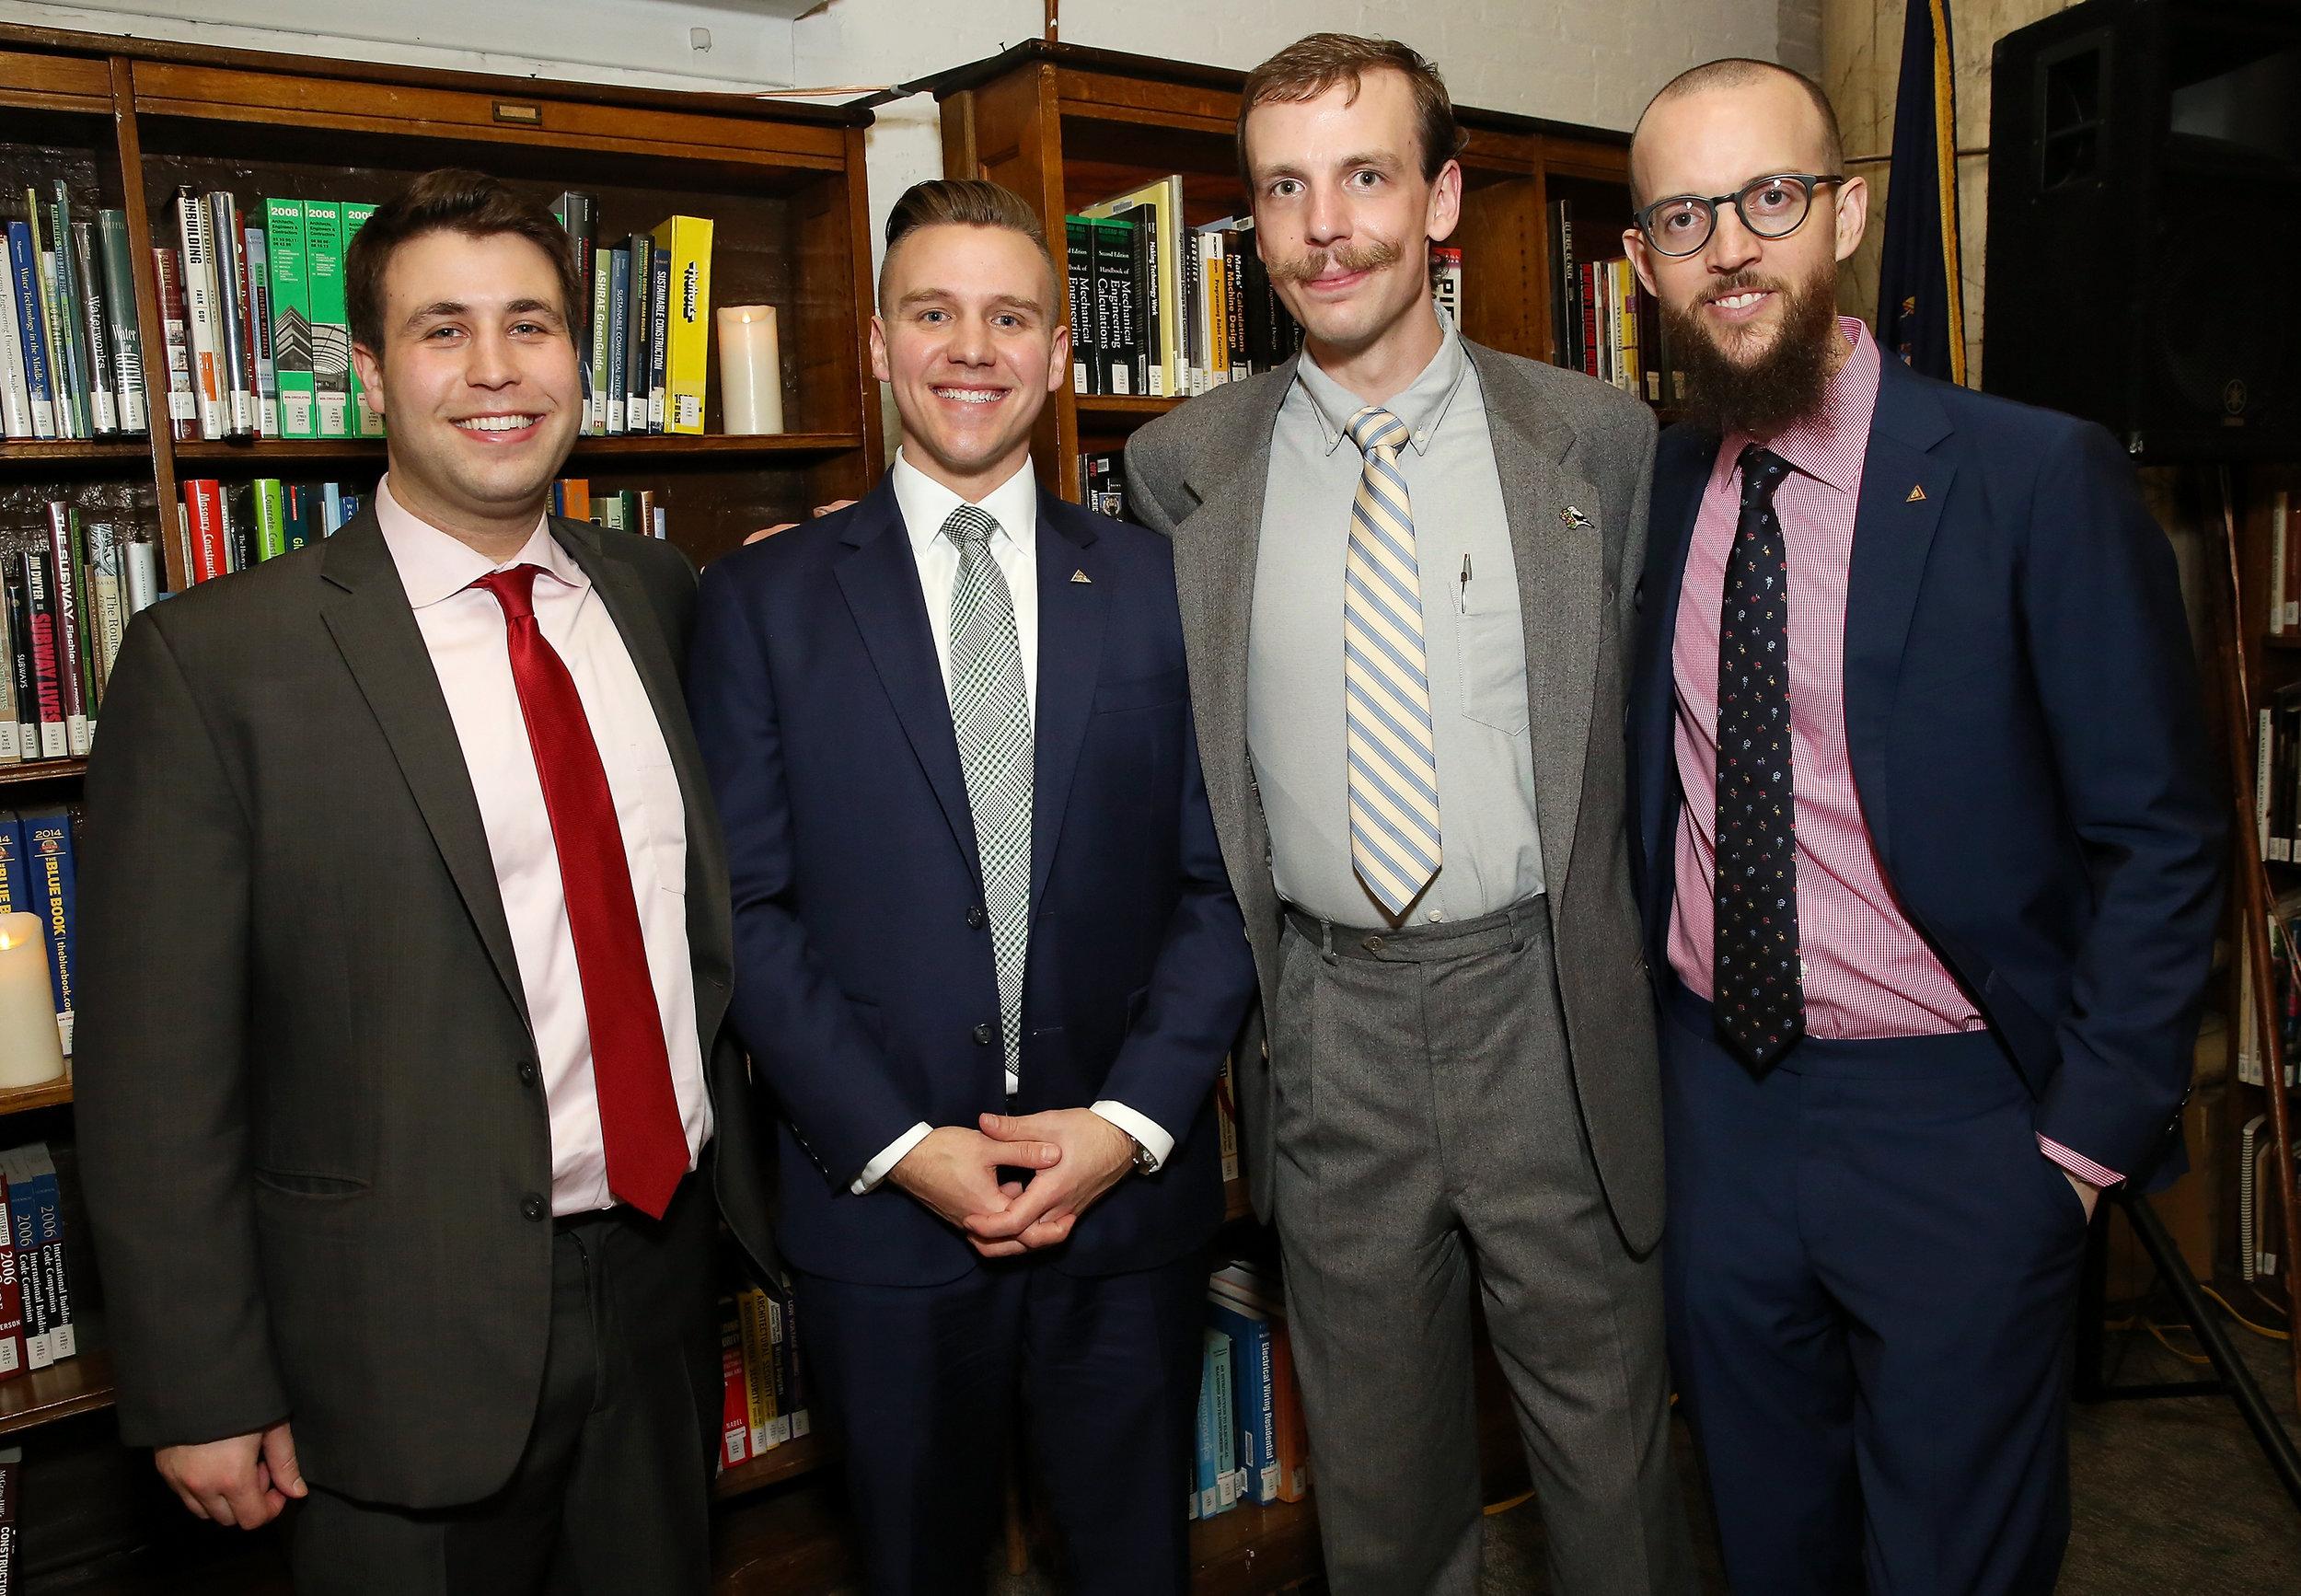 Michael Fossner, Steve Eagle, Justin Shellenberger and Nicholas Manousos